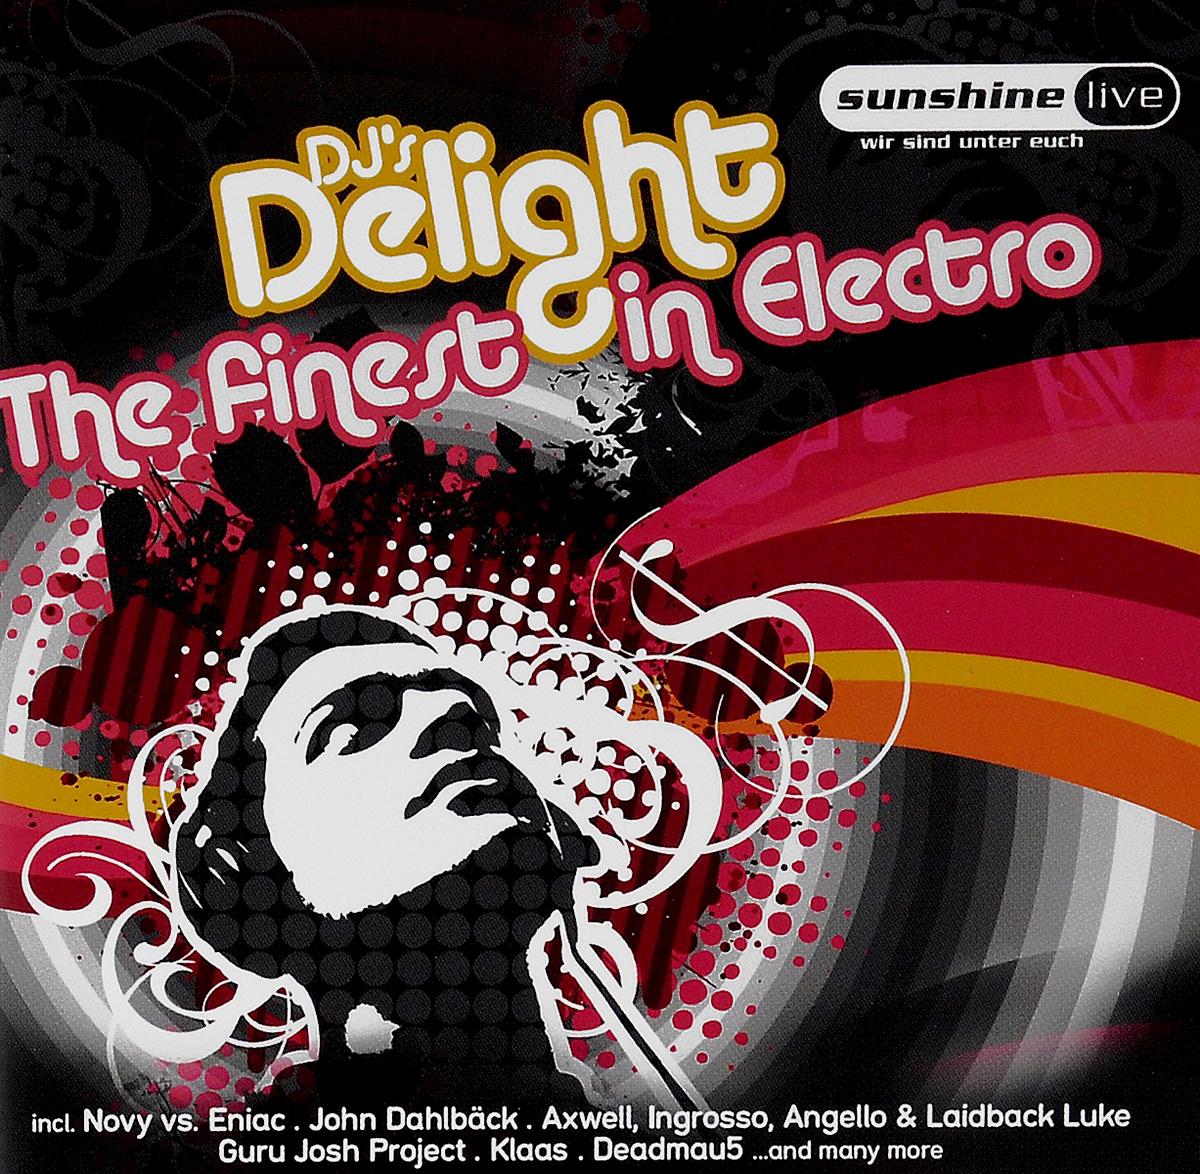 DJ Antoine Finest In Electro:Dj's Delight (2 CD) jansen пэрси дэйк city sneakerz майкл маршалл dj antoine mad mark electro house clubbing 2 cd